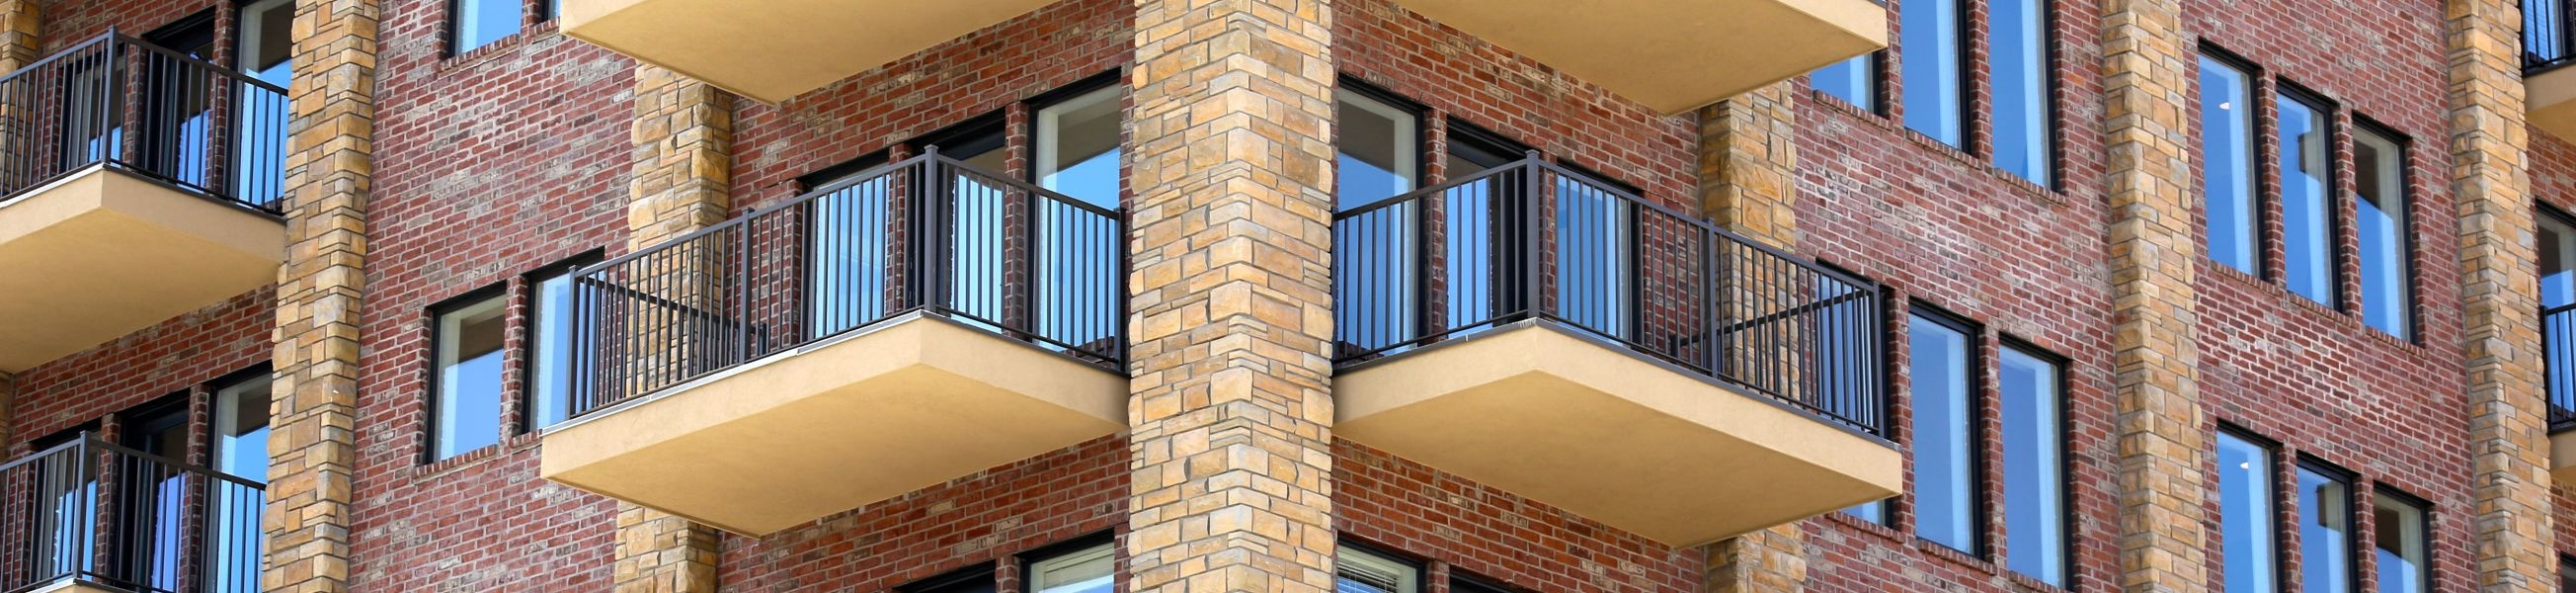 Balkon Bauen Kosten Preise